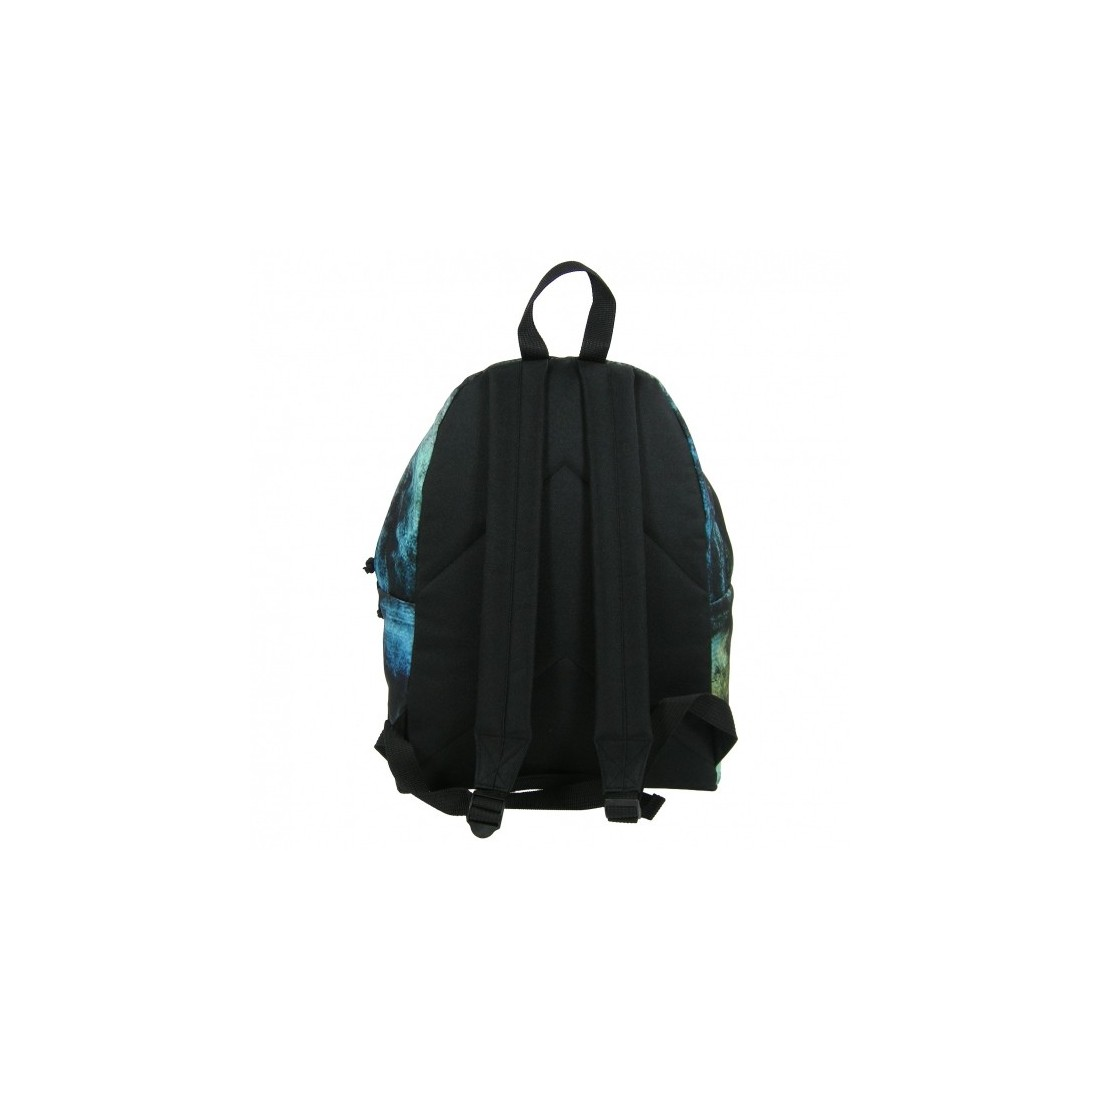 Plecak młodzieżowy Fullprint Grunge - plecak-tornister.pl